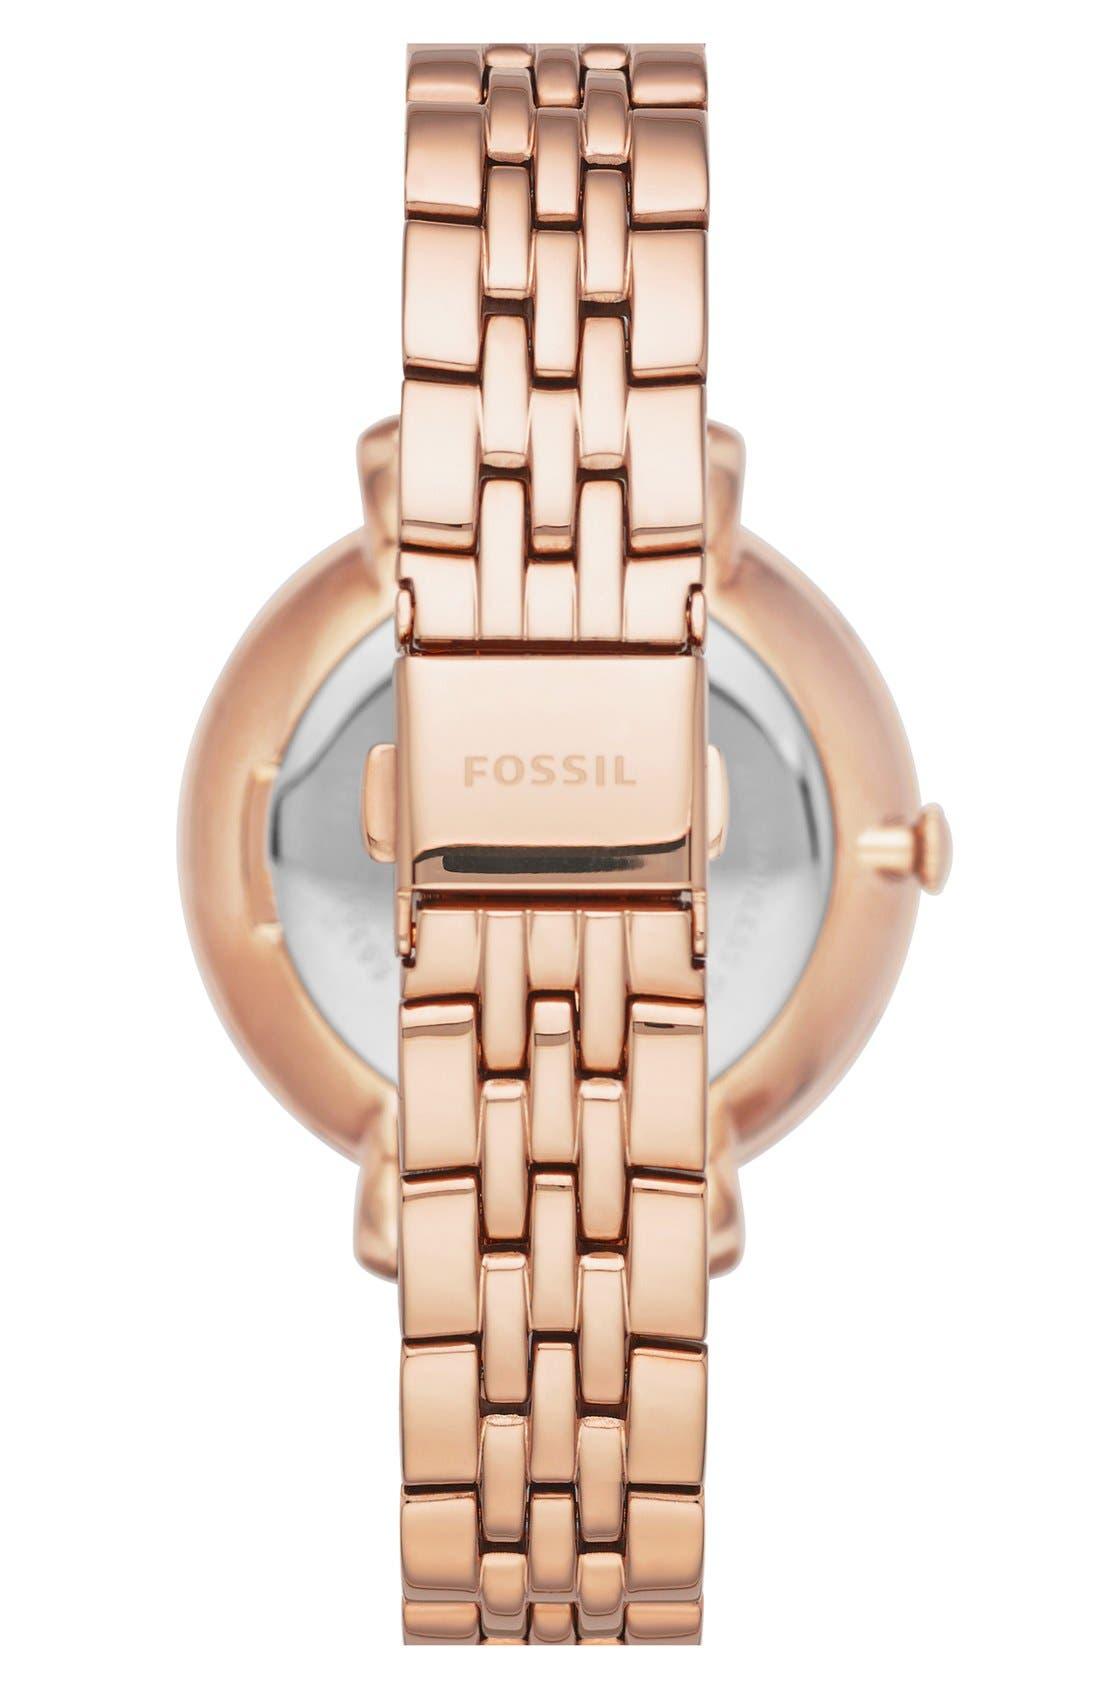 FOSSIL, 'Jacqueline' Crystal Bezel Bracelet Watch, 36mm, Alternate thumbnail 3, color, ROSE GOLD